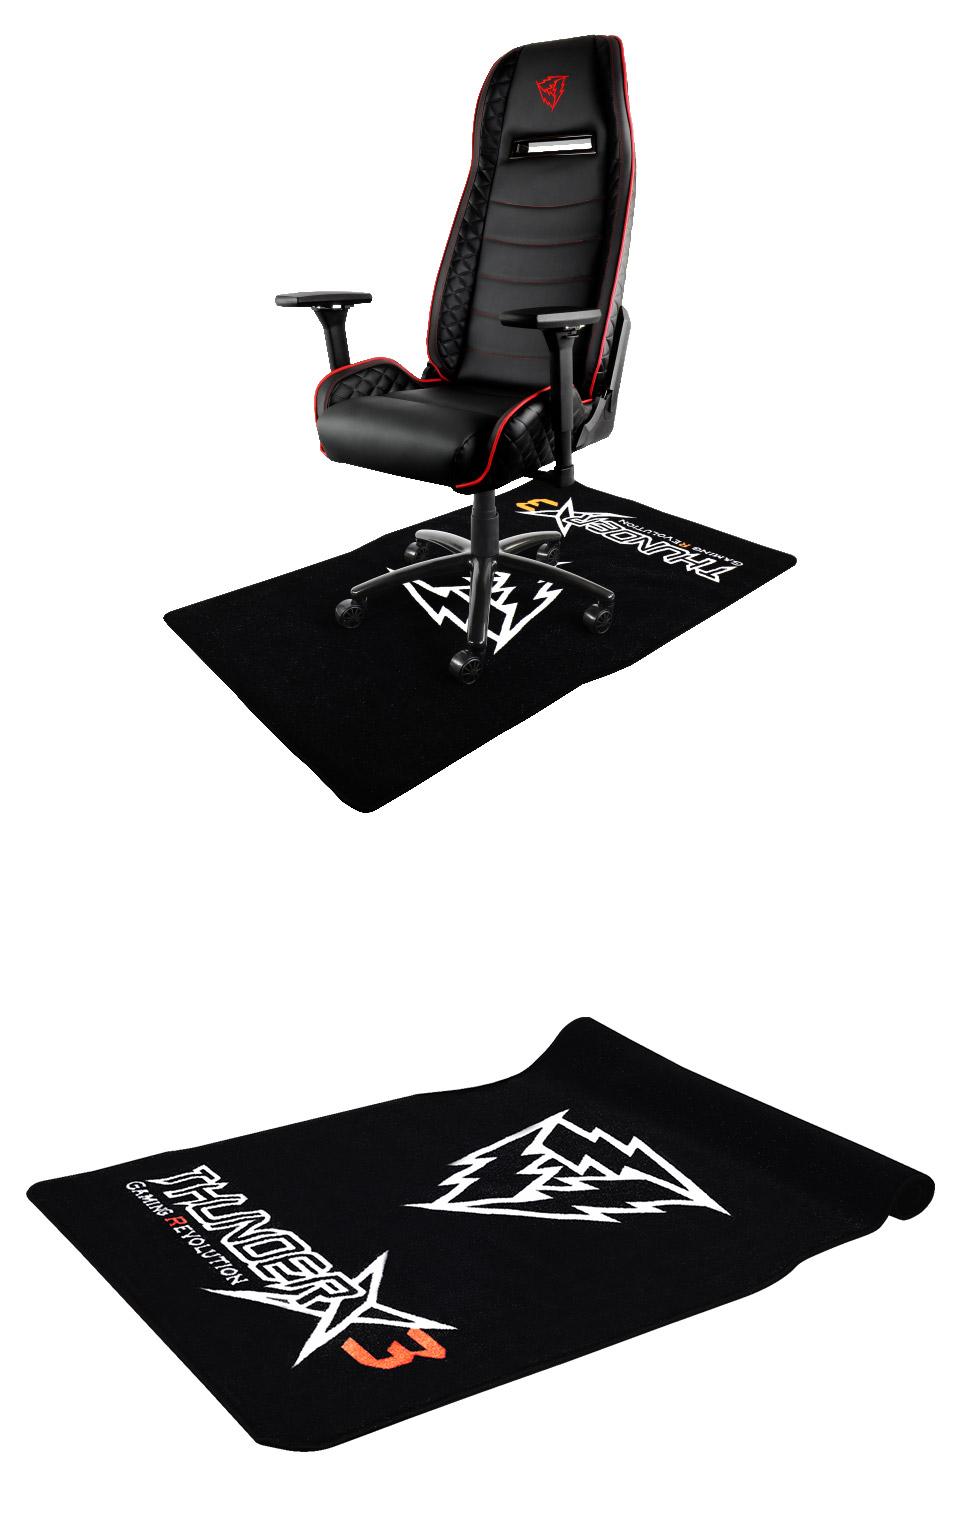 Aerocool Thunderx3 Tgm20 Gaming Hard Surface Floor Mat